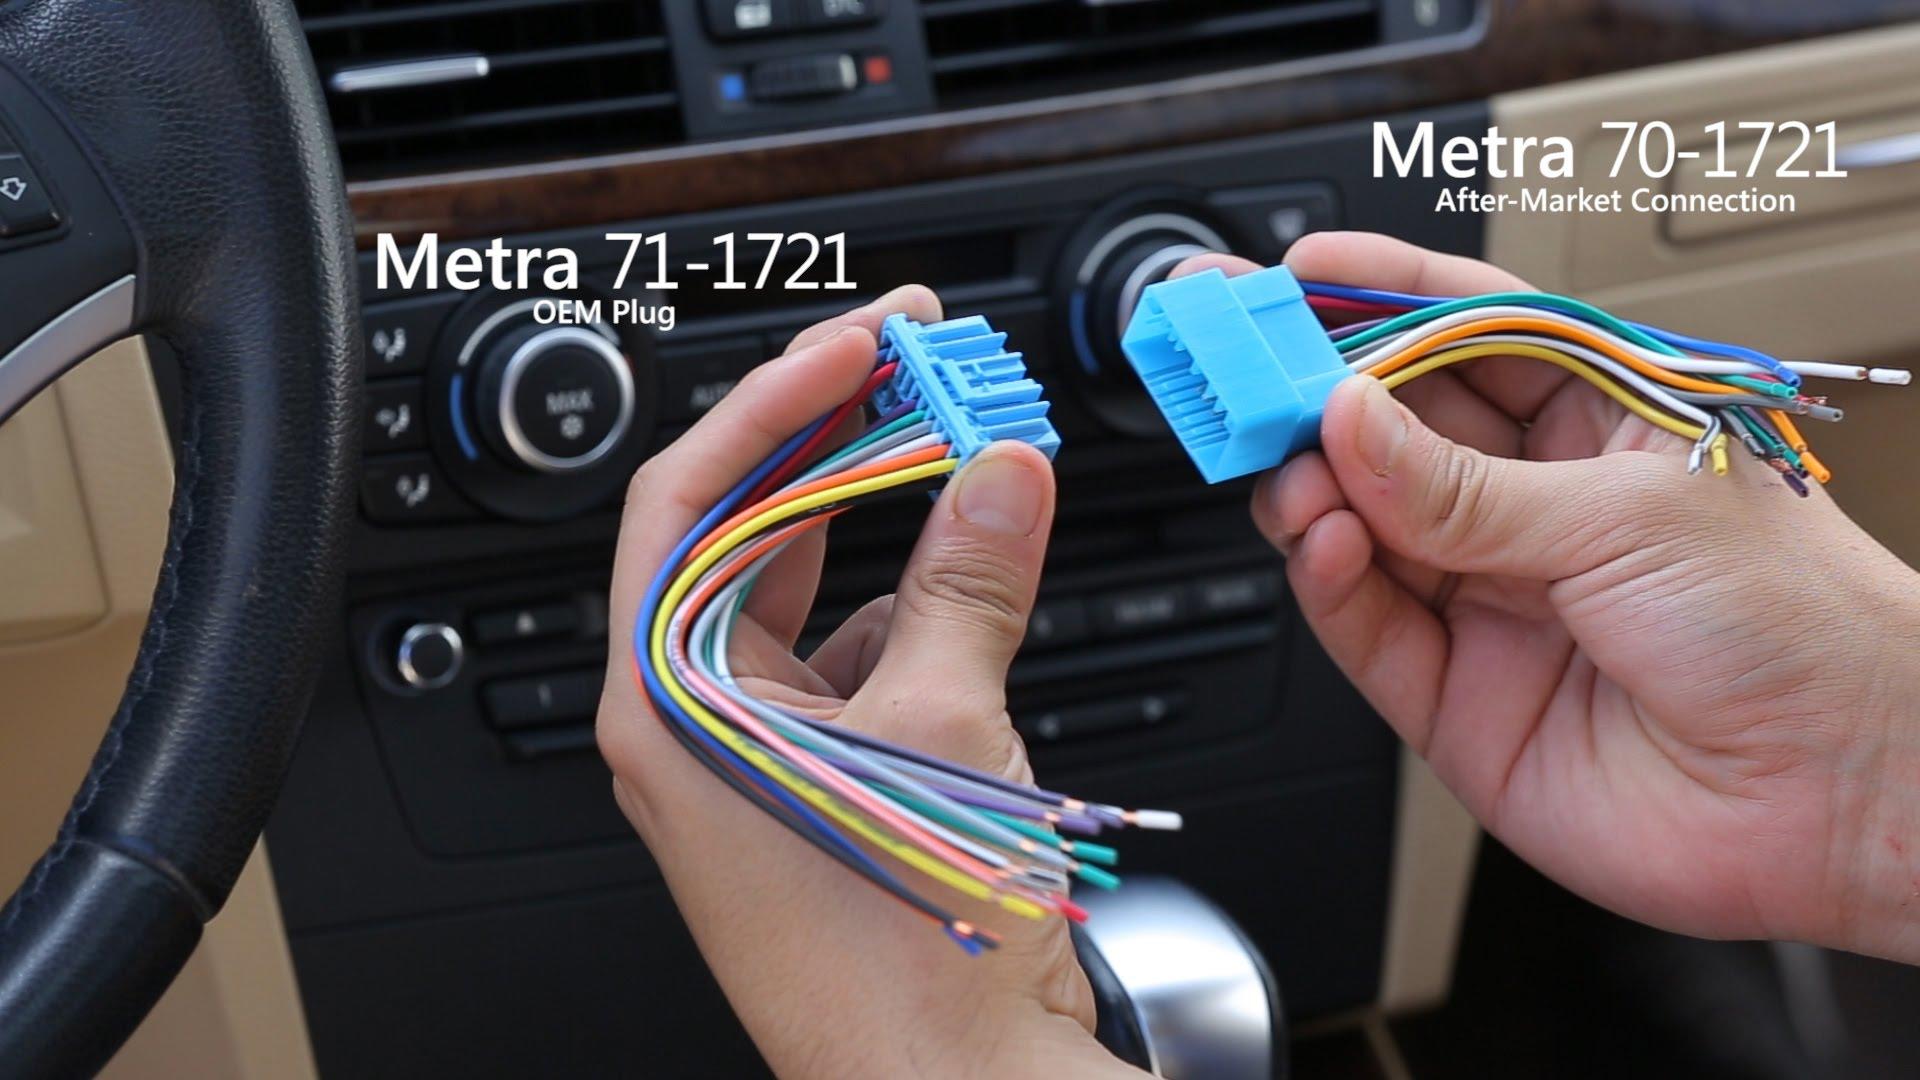 Metra 70-1721 Wiring Harness For Acura Honda Vehicles